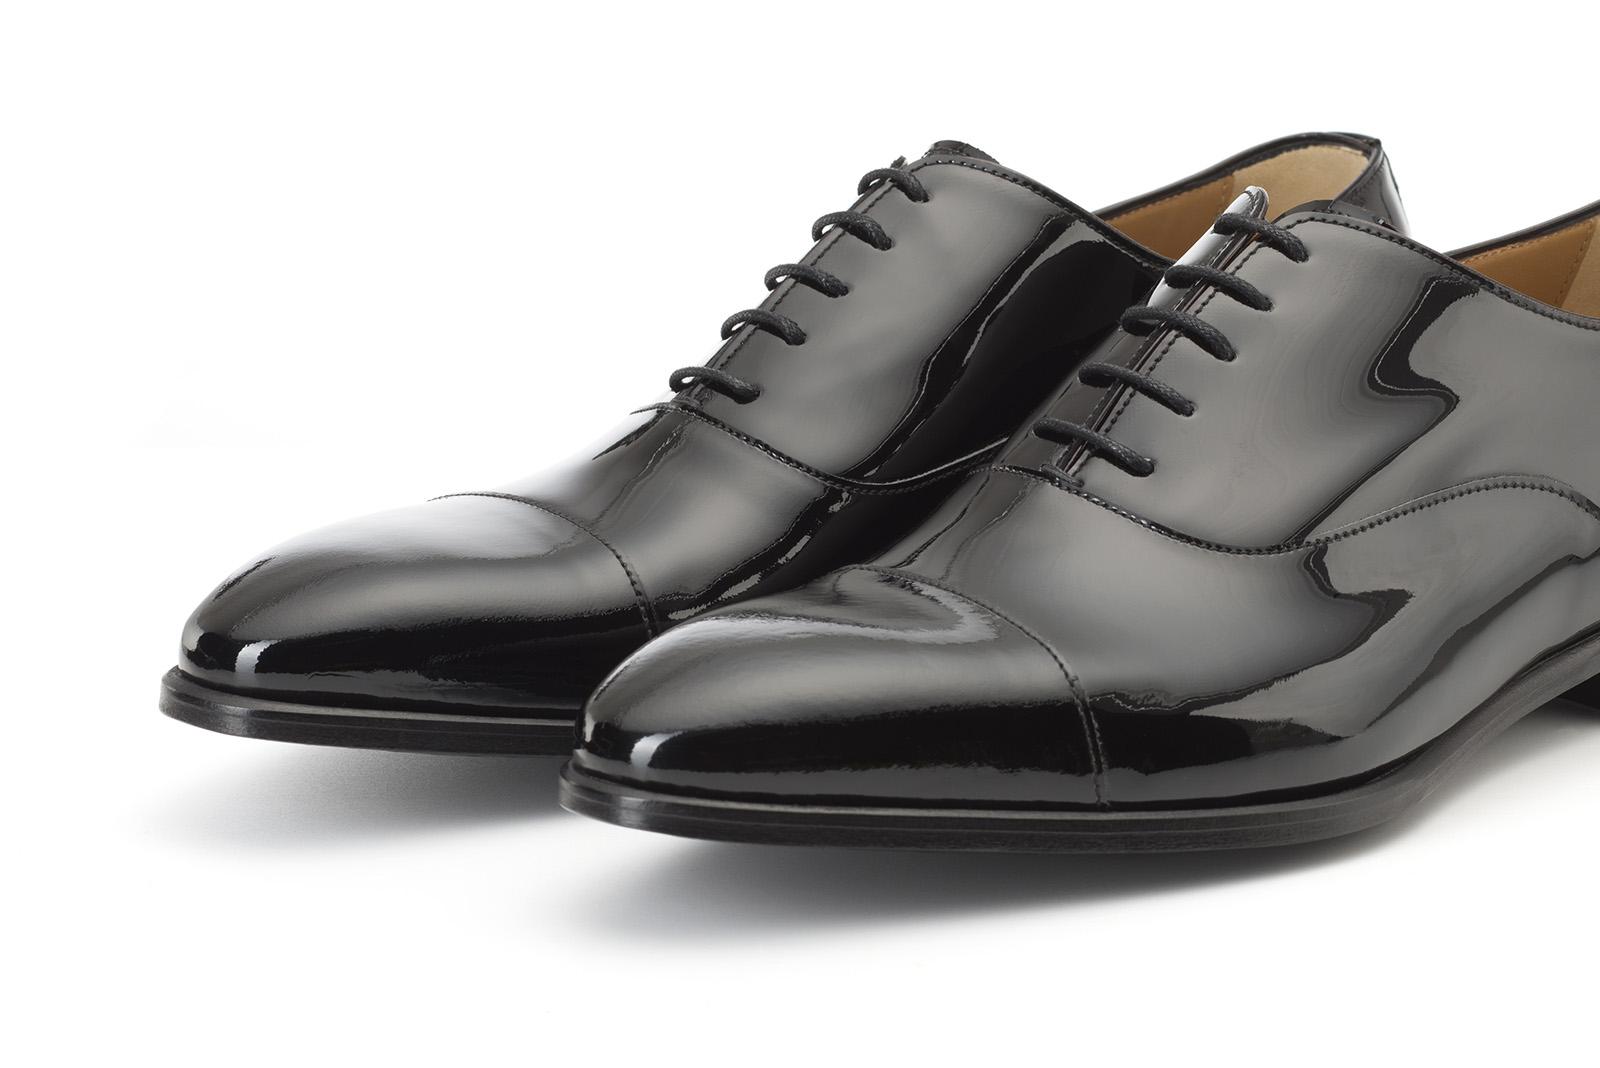 calzature lusso